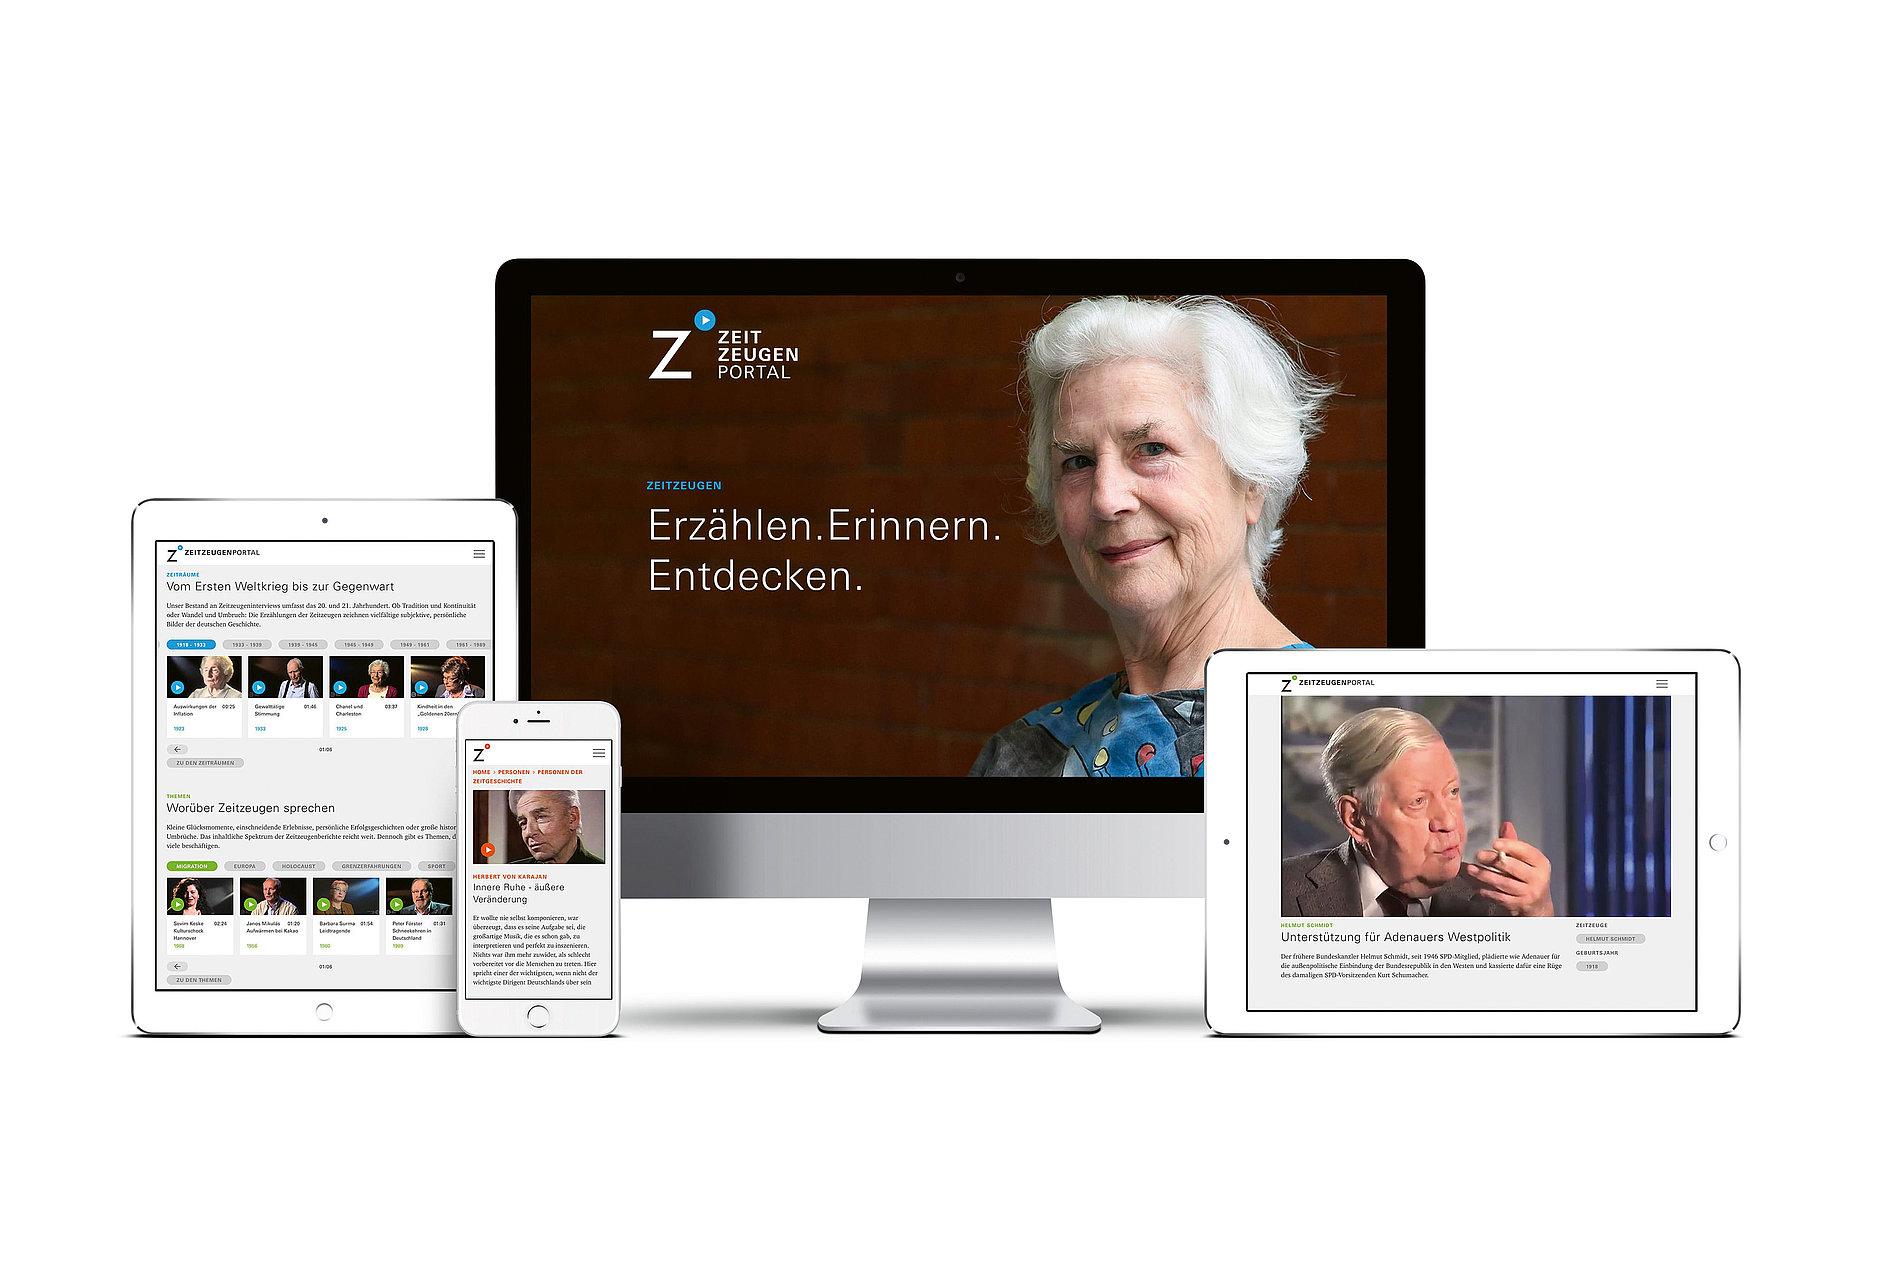 zeitzeugen-portal.deErzählen. Erinnern. Entdecken.   Red Dot Design Award